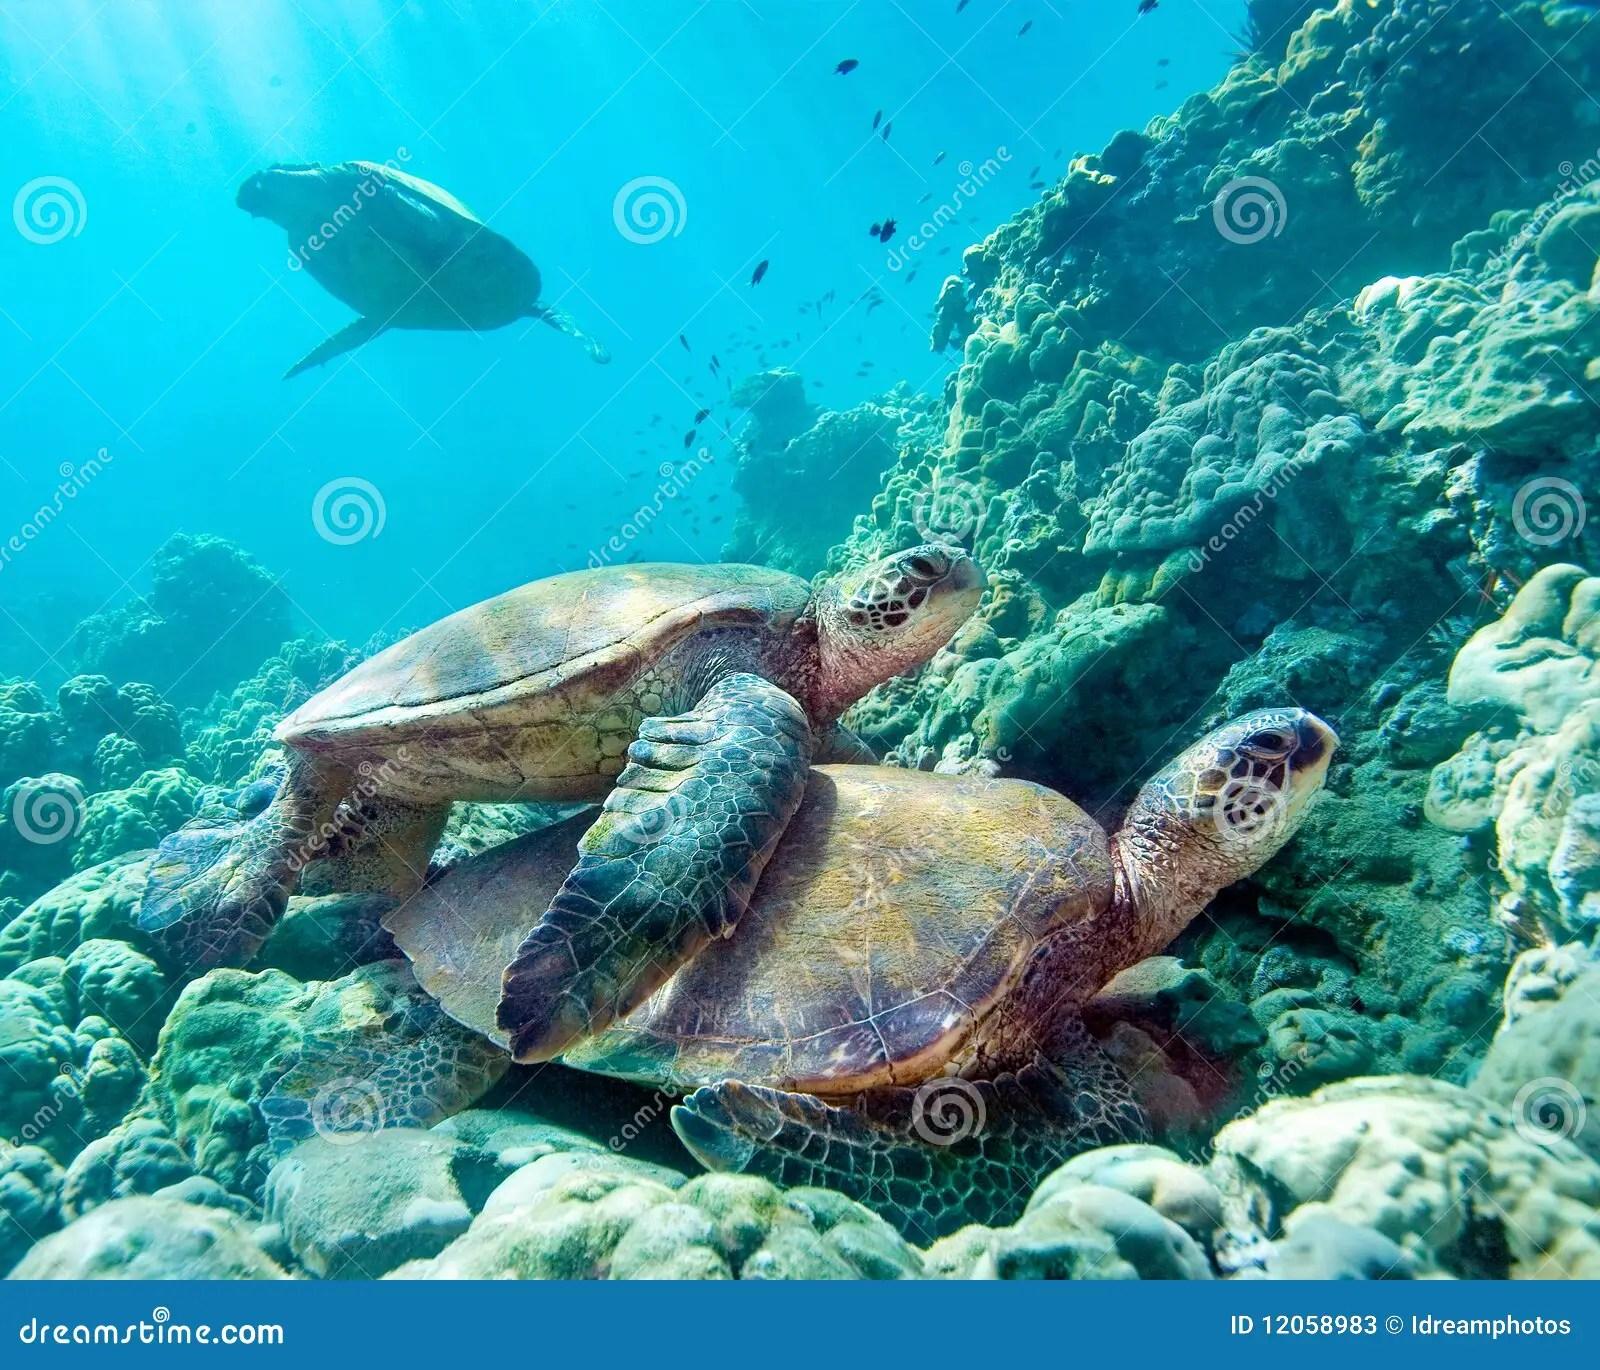 Hd Fish Live Wallpaper For Pc Sea Turtles Maui Hawaii Stock Image Image Of Close Shell